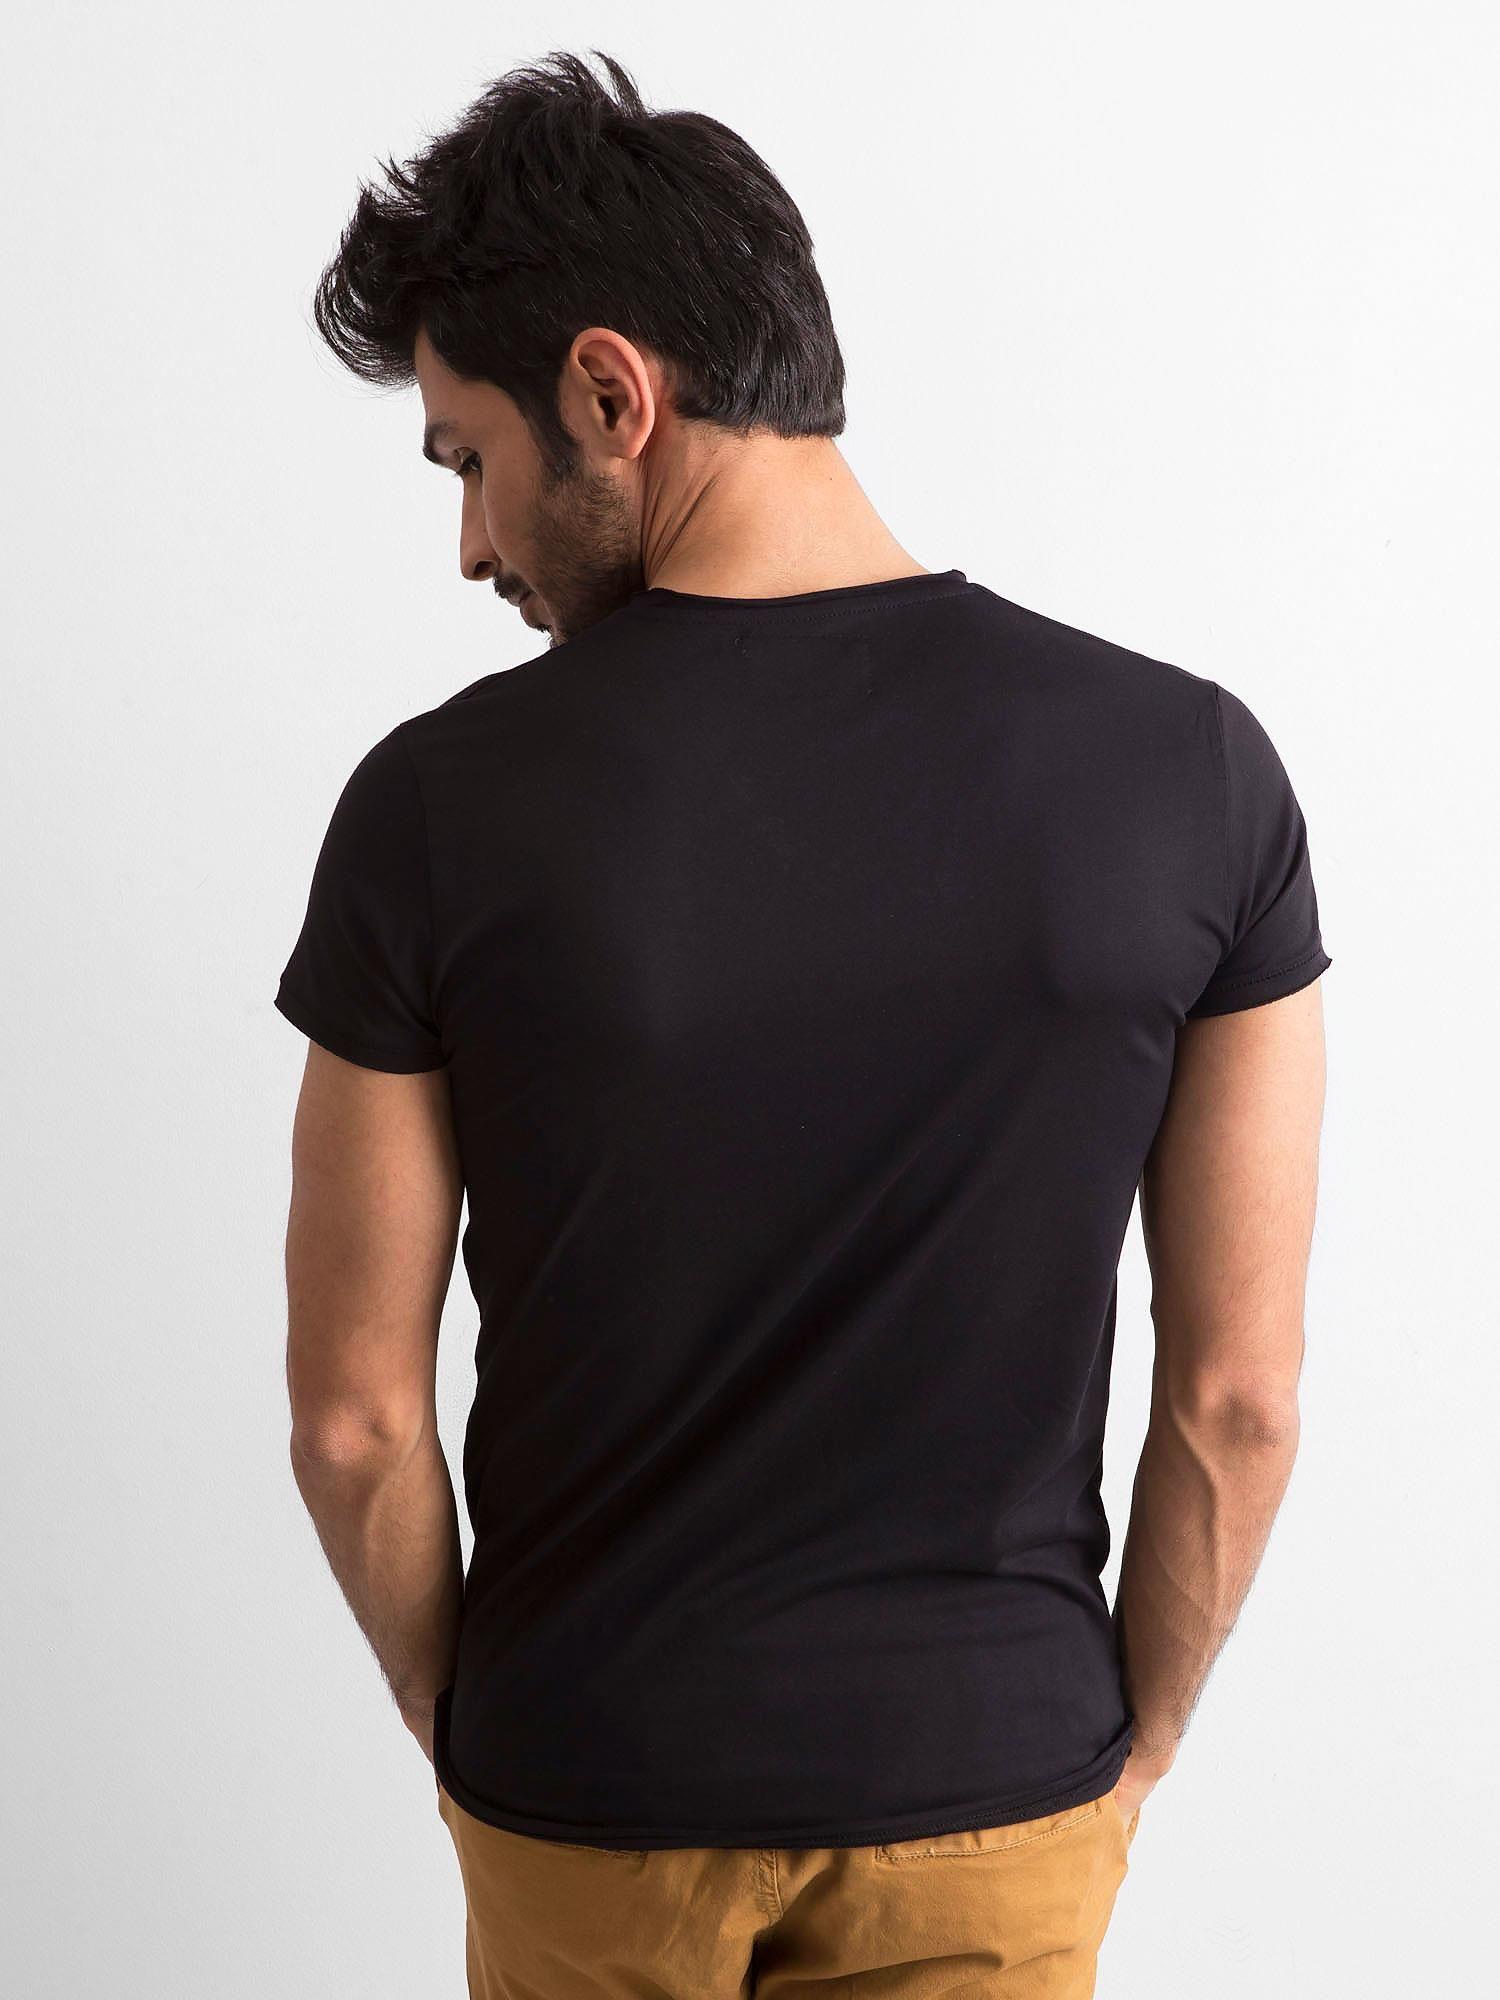 939718af1eb889 Koszulka męska z dekoltem w serek czarna - Mężczyźni T-shirt męski - sklep  eButik.pl